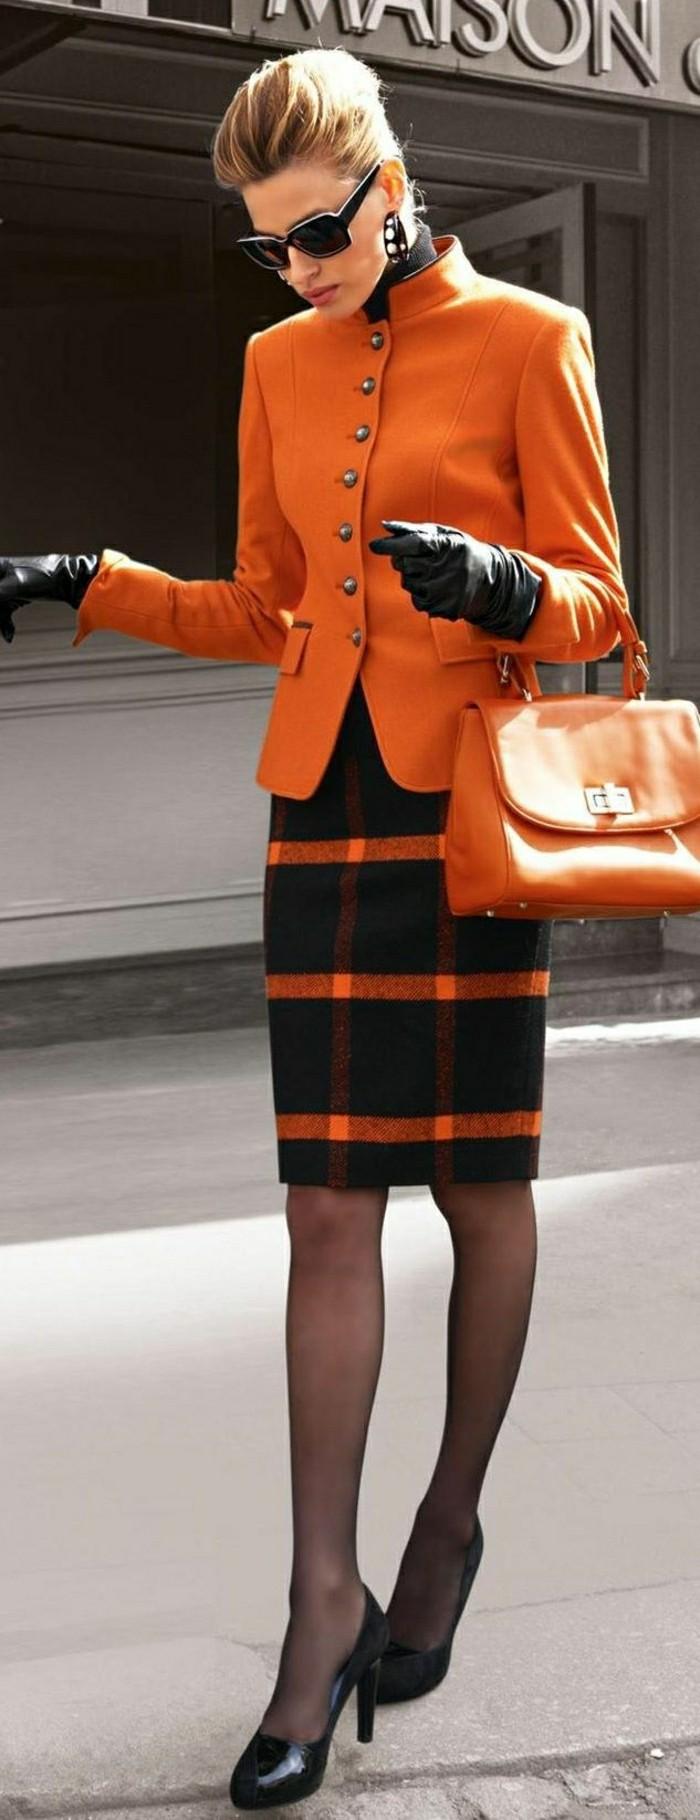 2-design-gant-chauffant-pas-cher-design-cuir-noir-femme-moderne-elegant-gant-cuir-noir